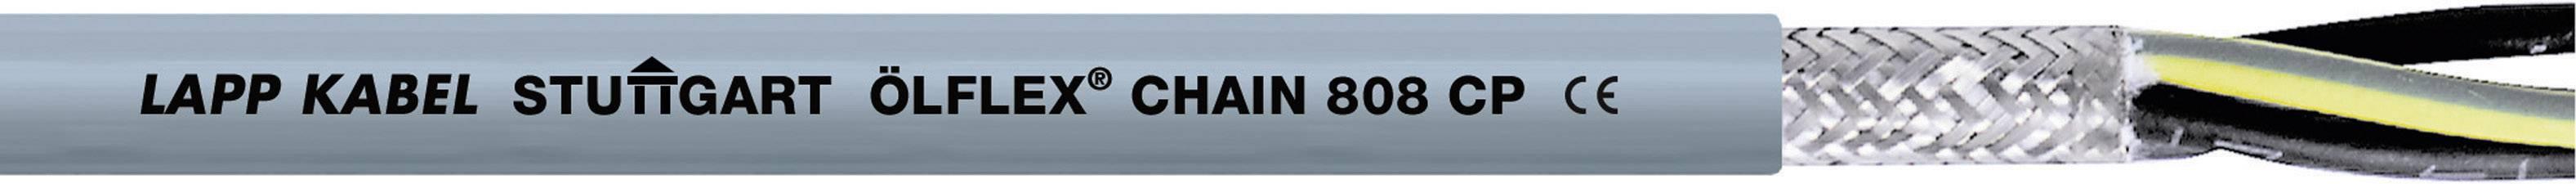 Žíla kabelu LappKabel ÖLFLEX CHAIN 808 CP 3G1,0 (1027768), 3x 1 mm², polyurethan, Ø 6,9 mm, stíněný, 1 m, šedá